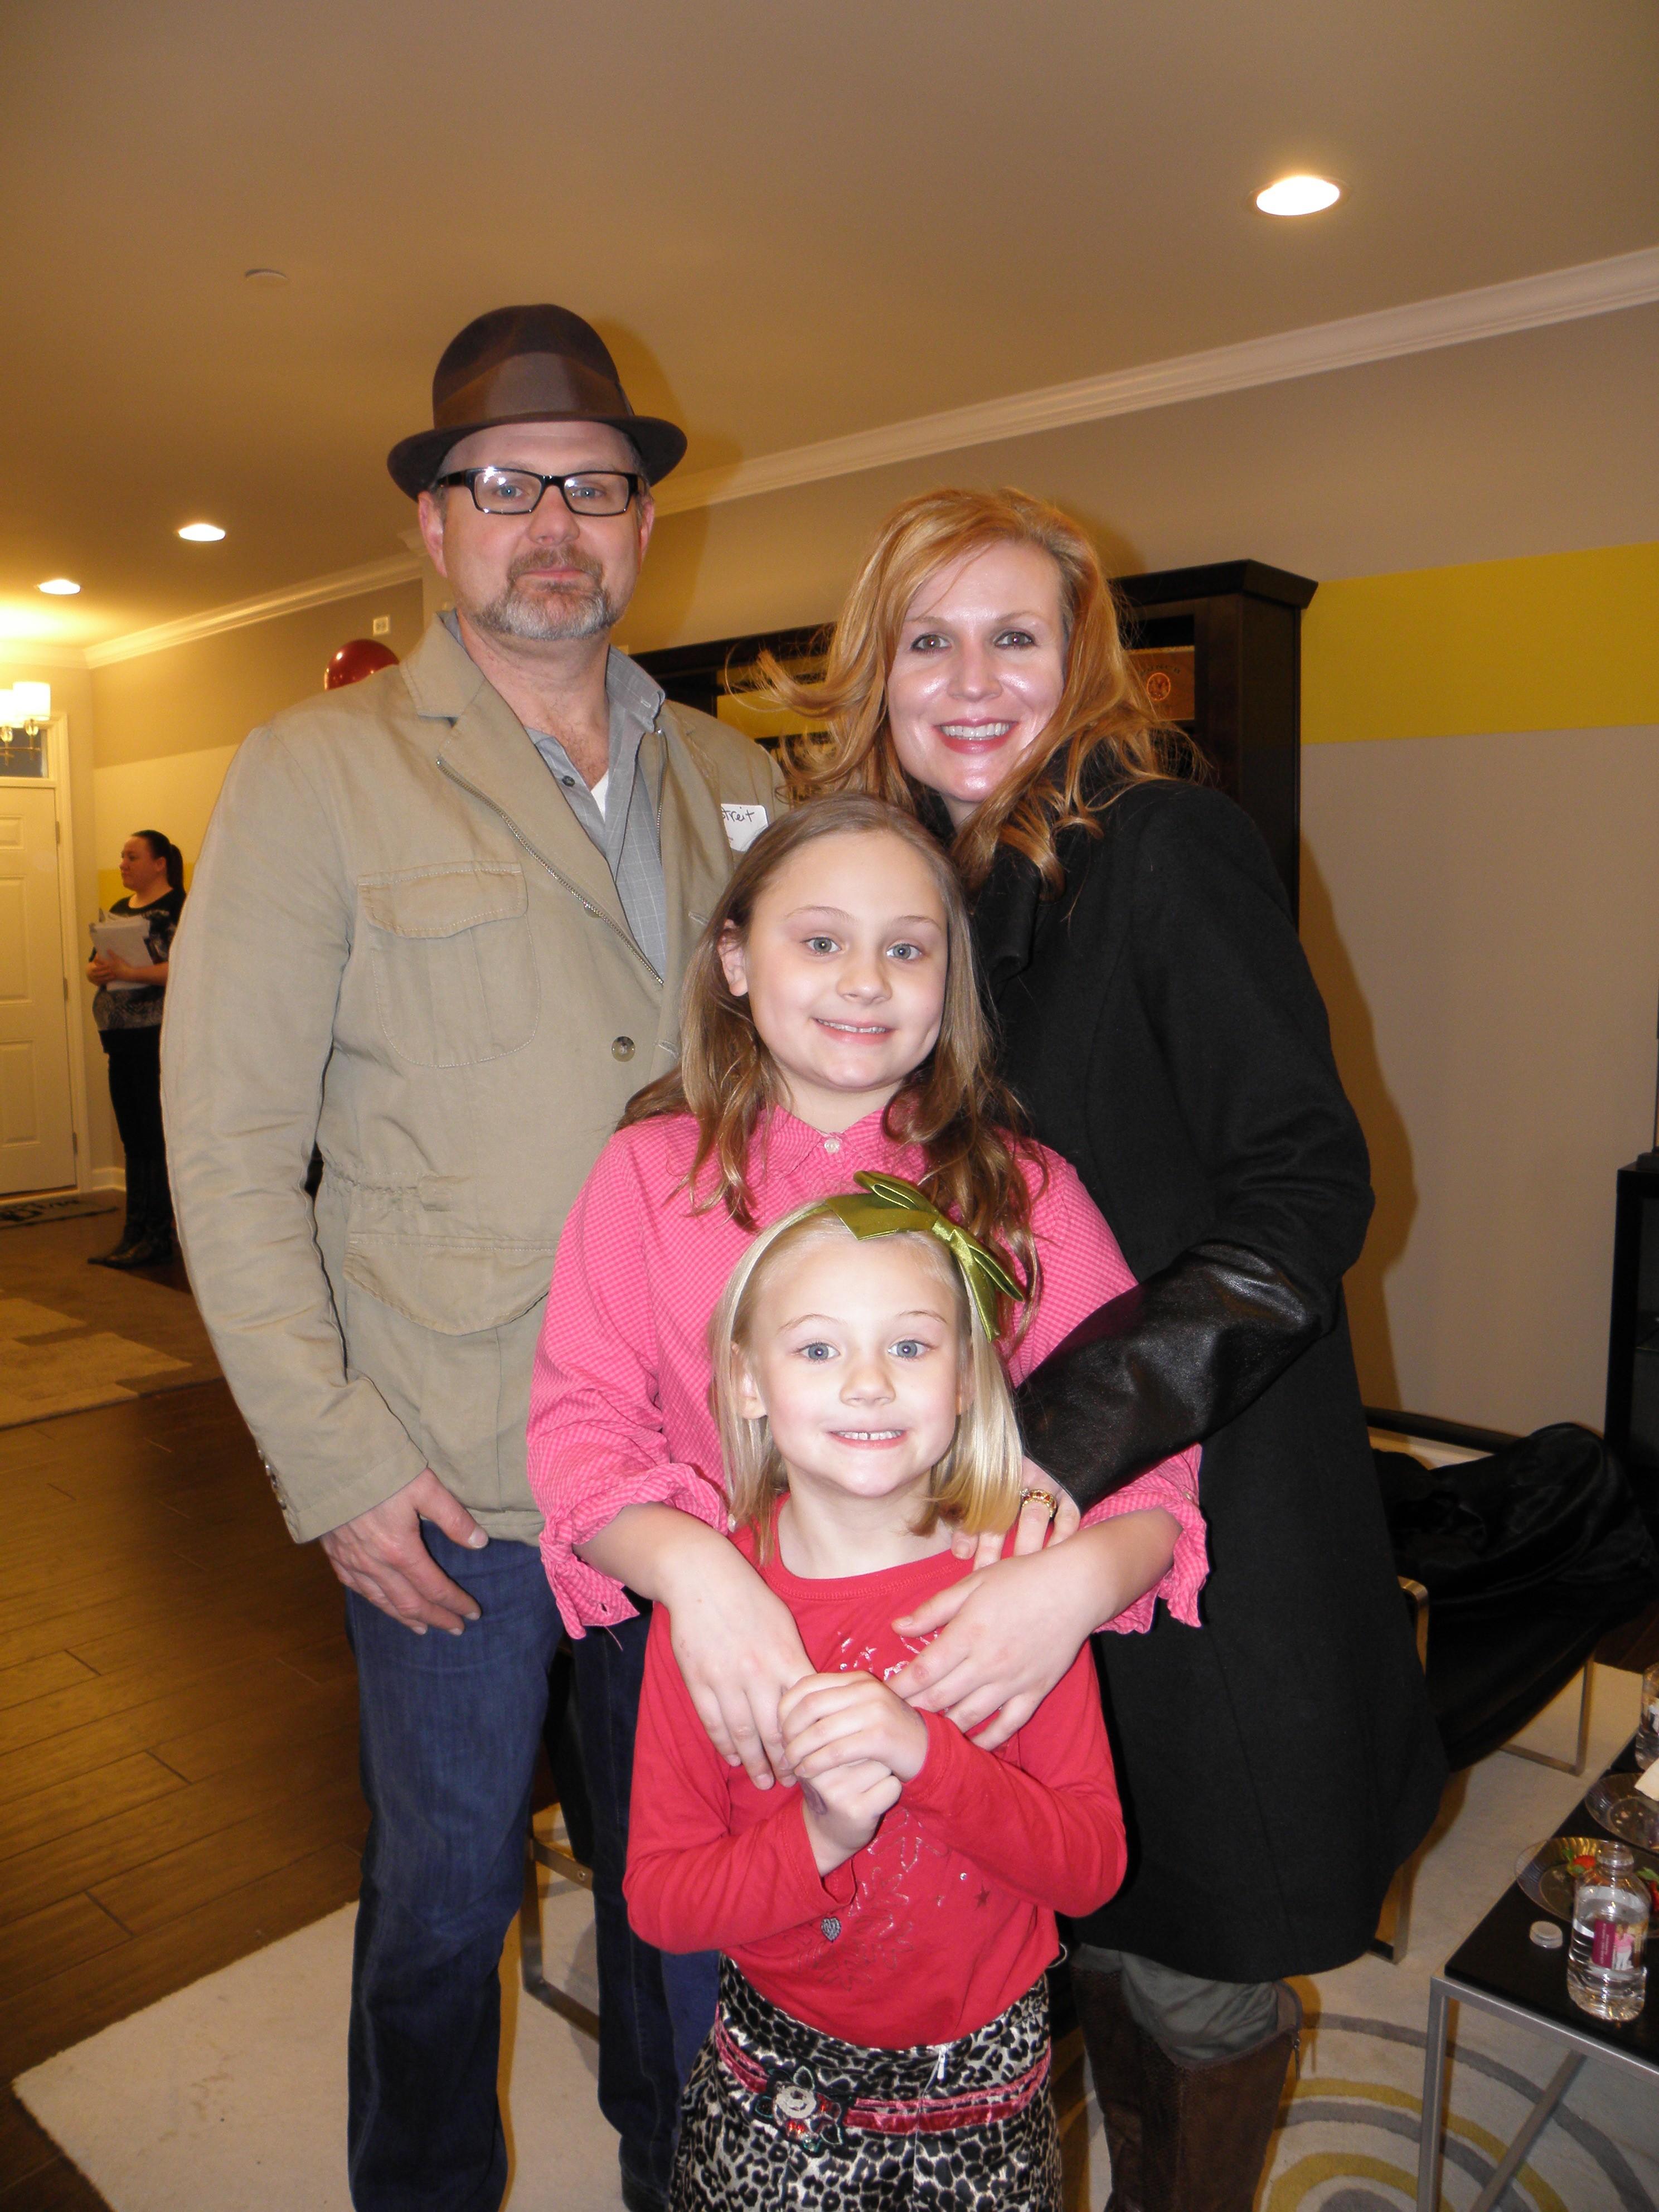 Steve-Wendy-standing-Zoey-middle-Penelope-front-Streit-e1457717769451.jpg